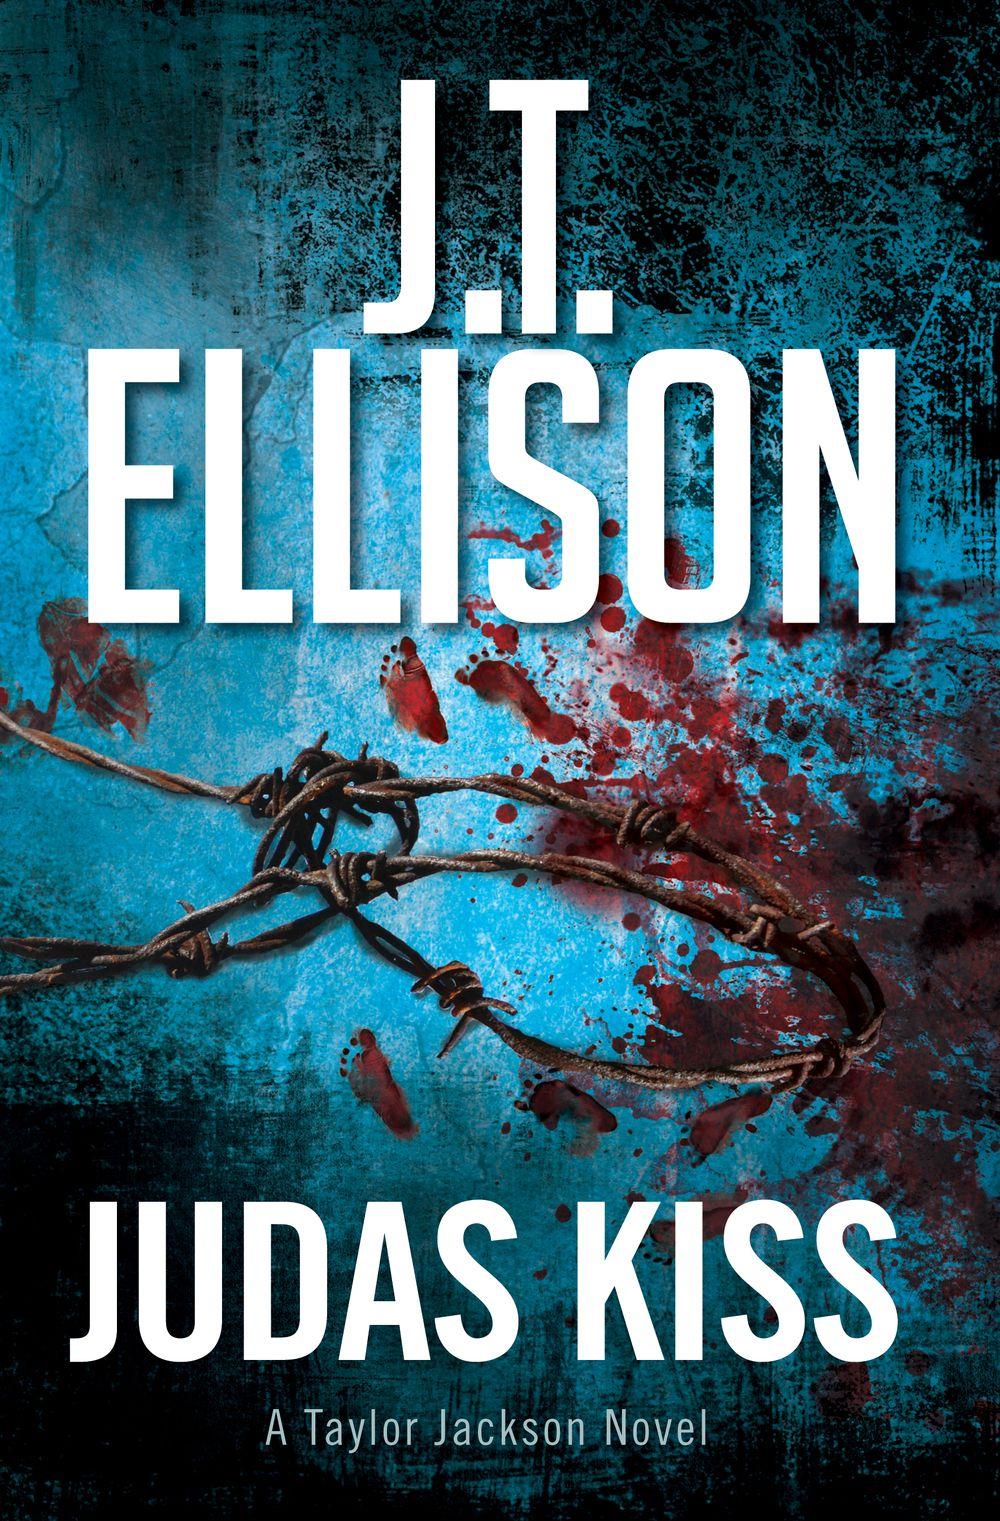 Judas kiss by jt ellison